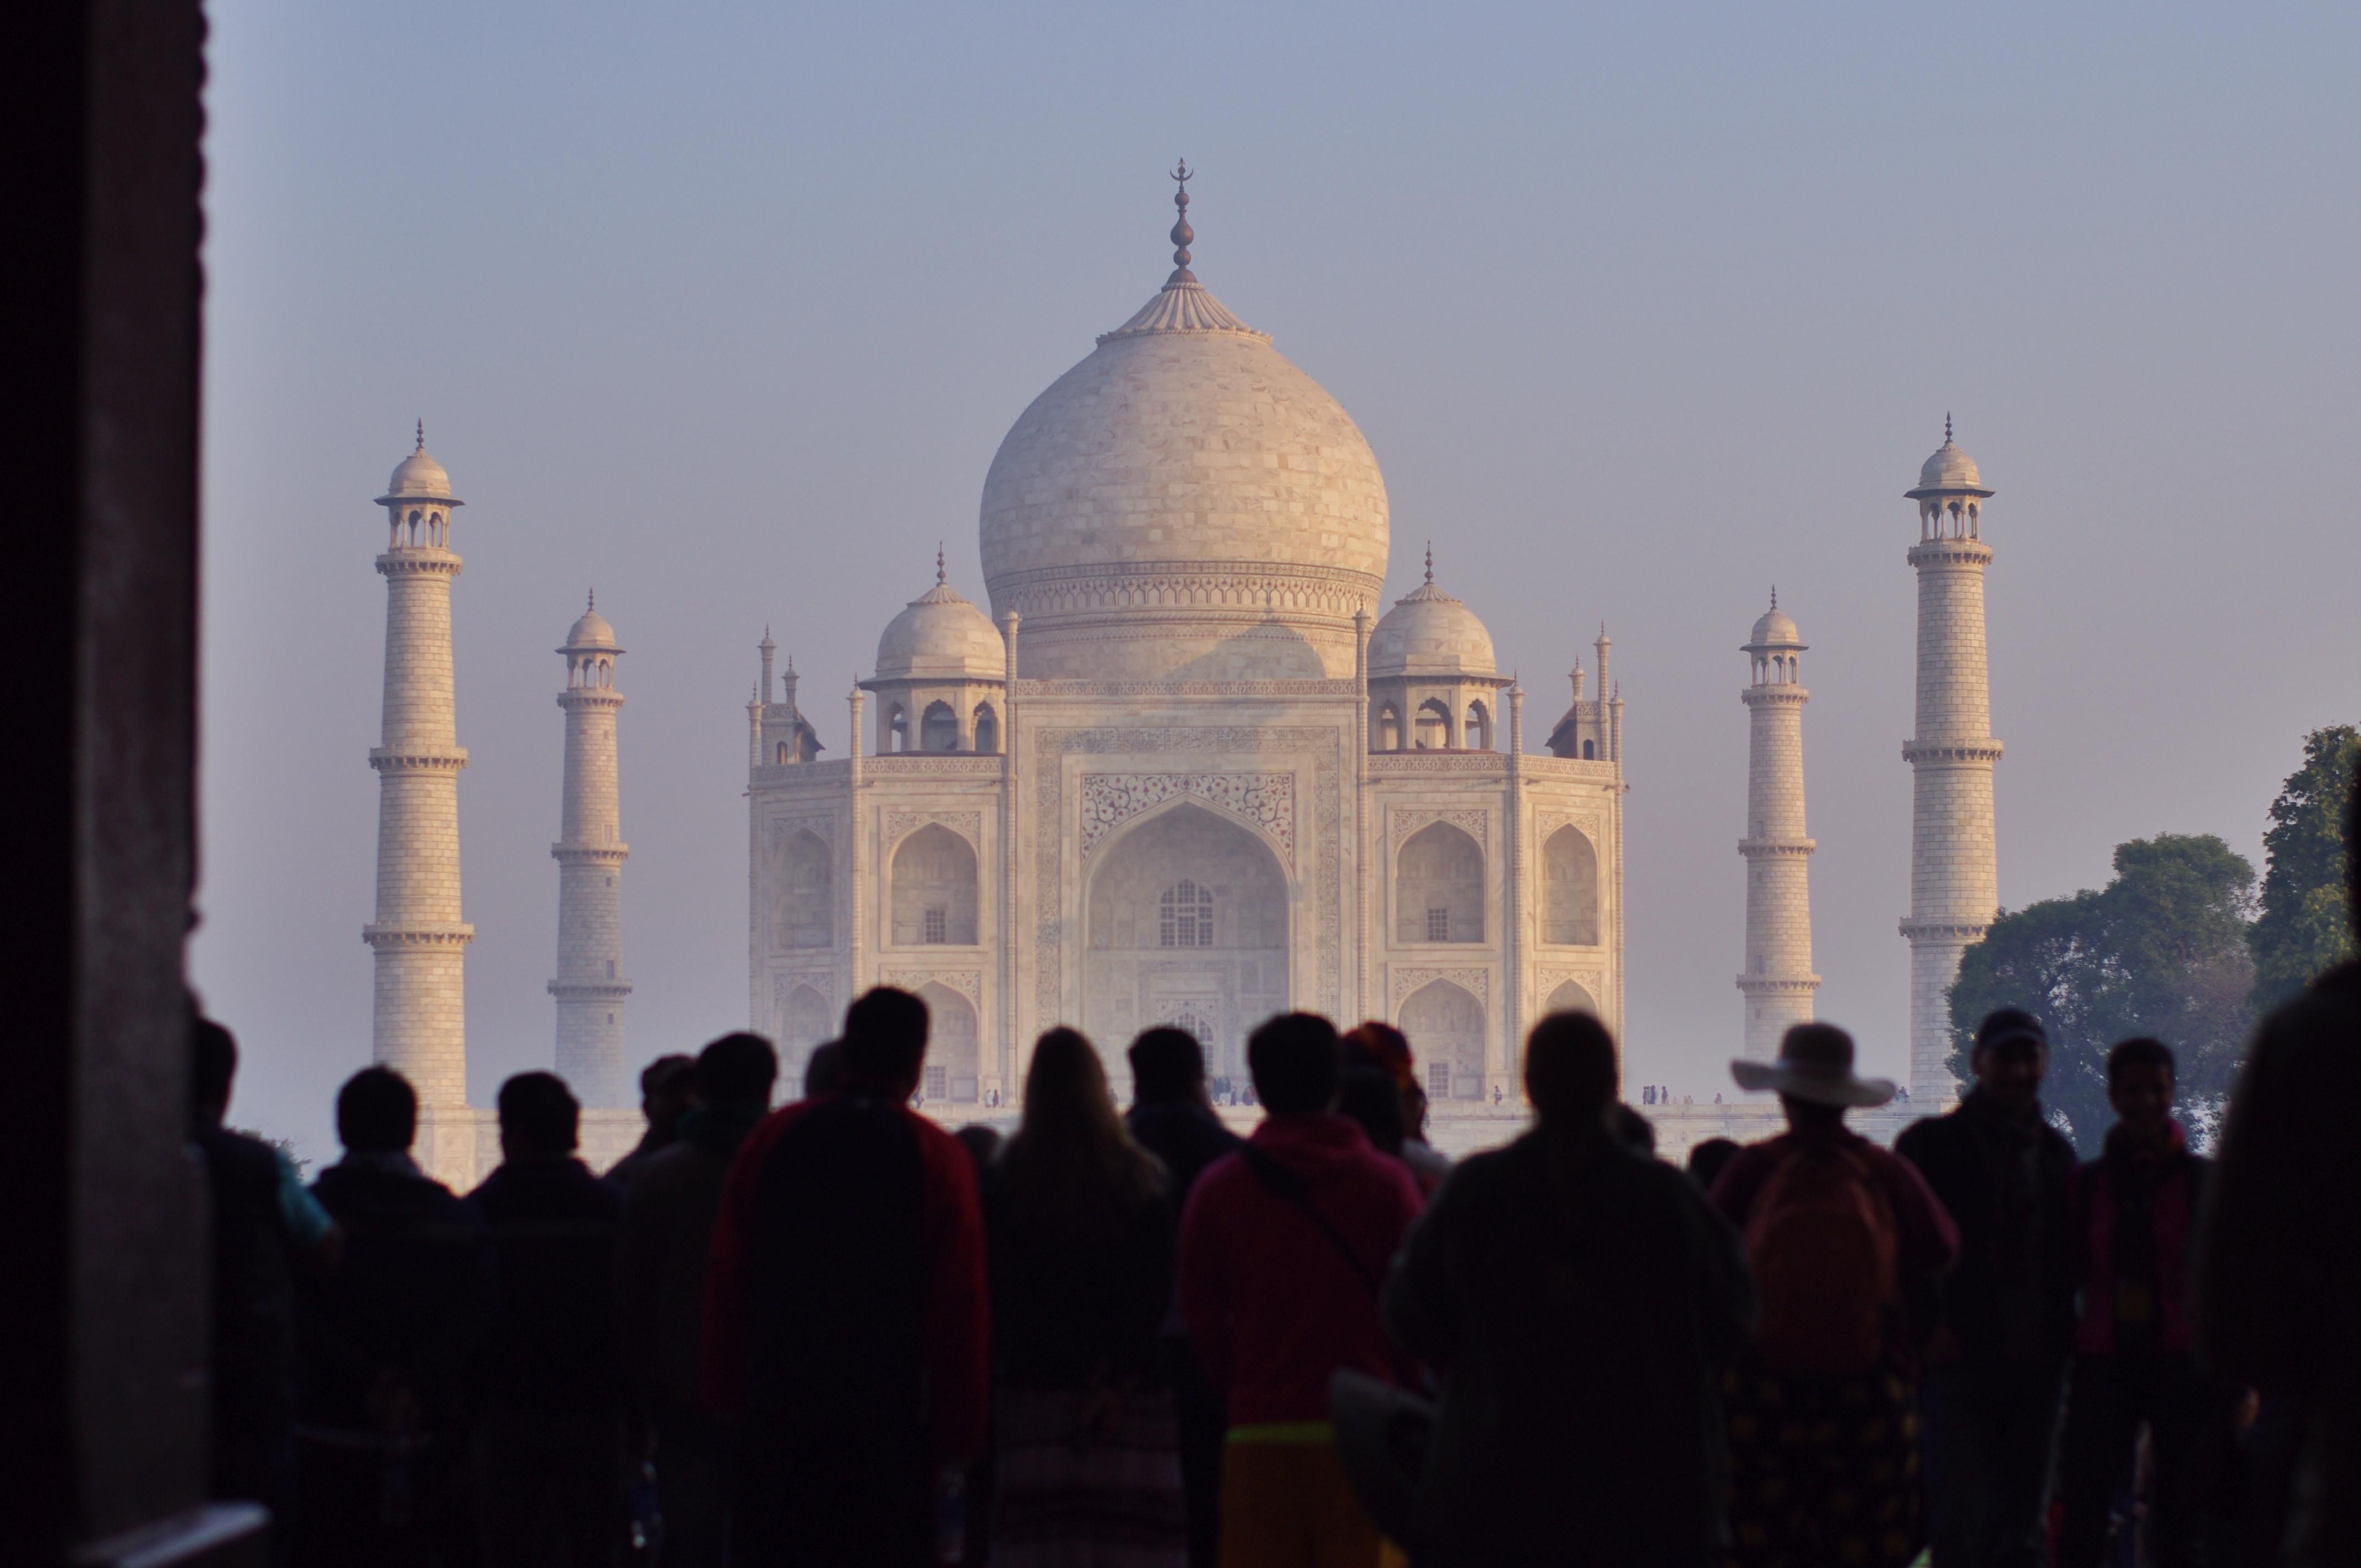 Image of the Taj Mahal in India